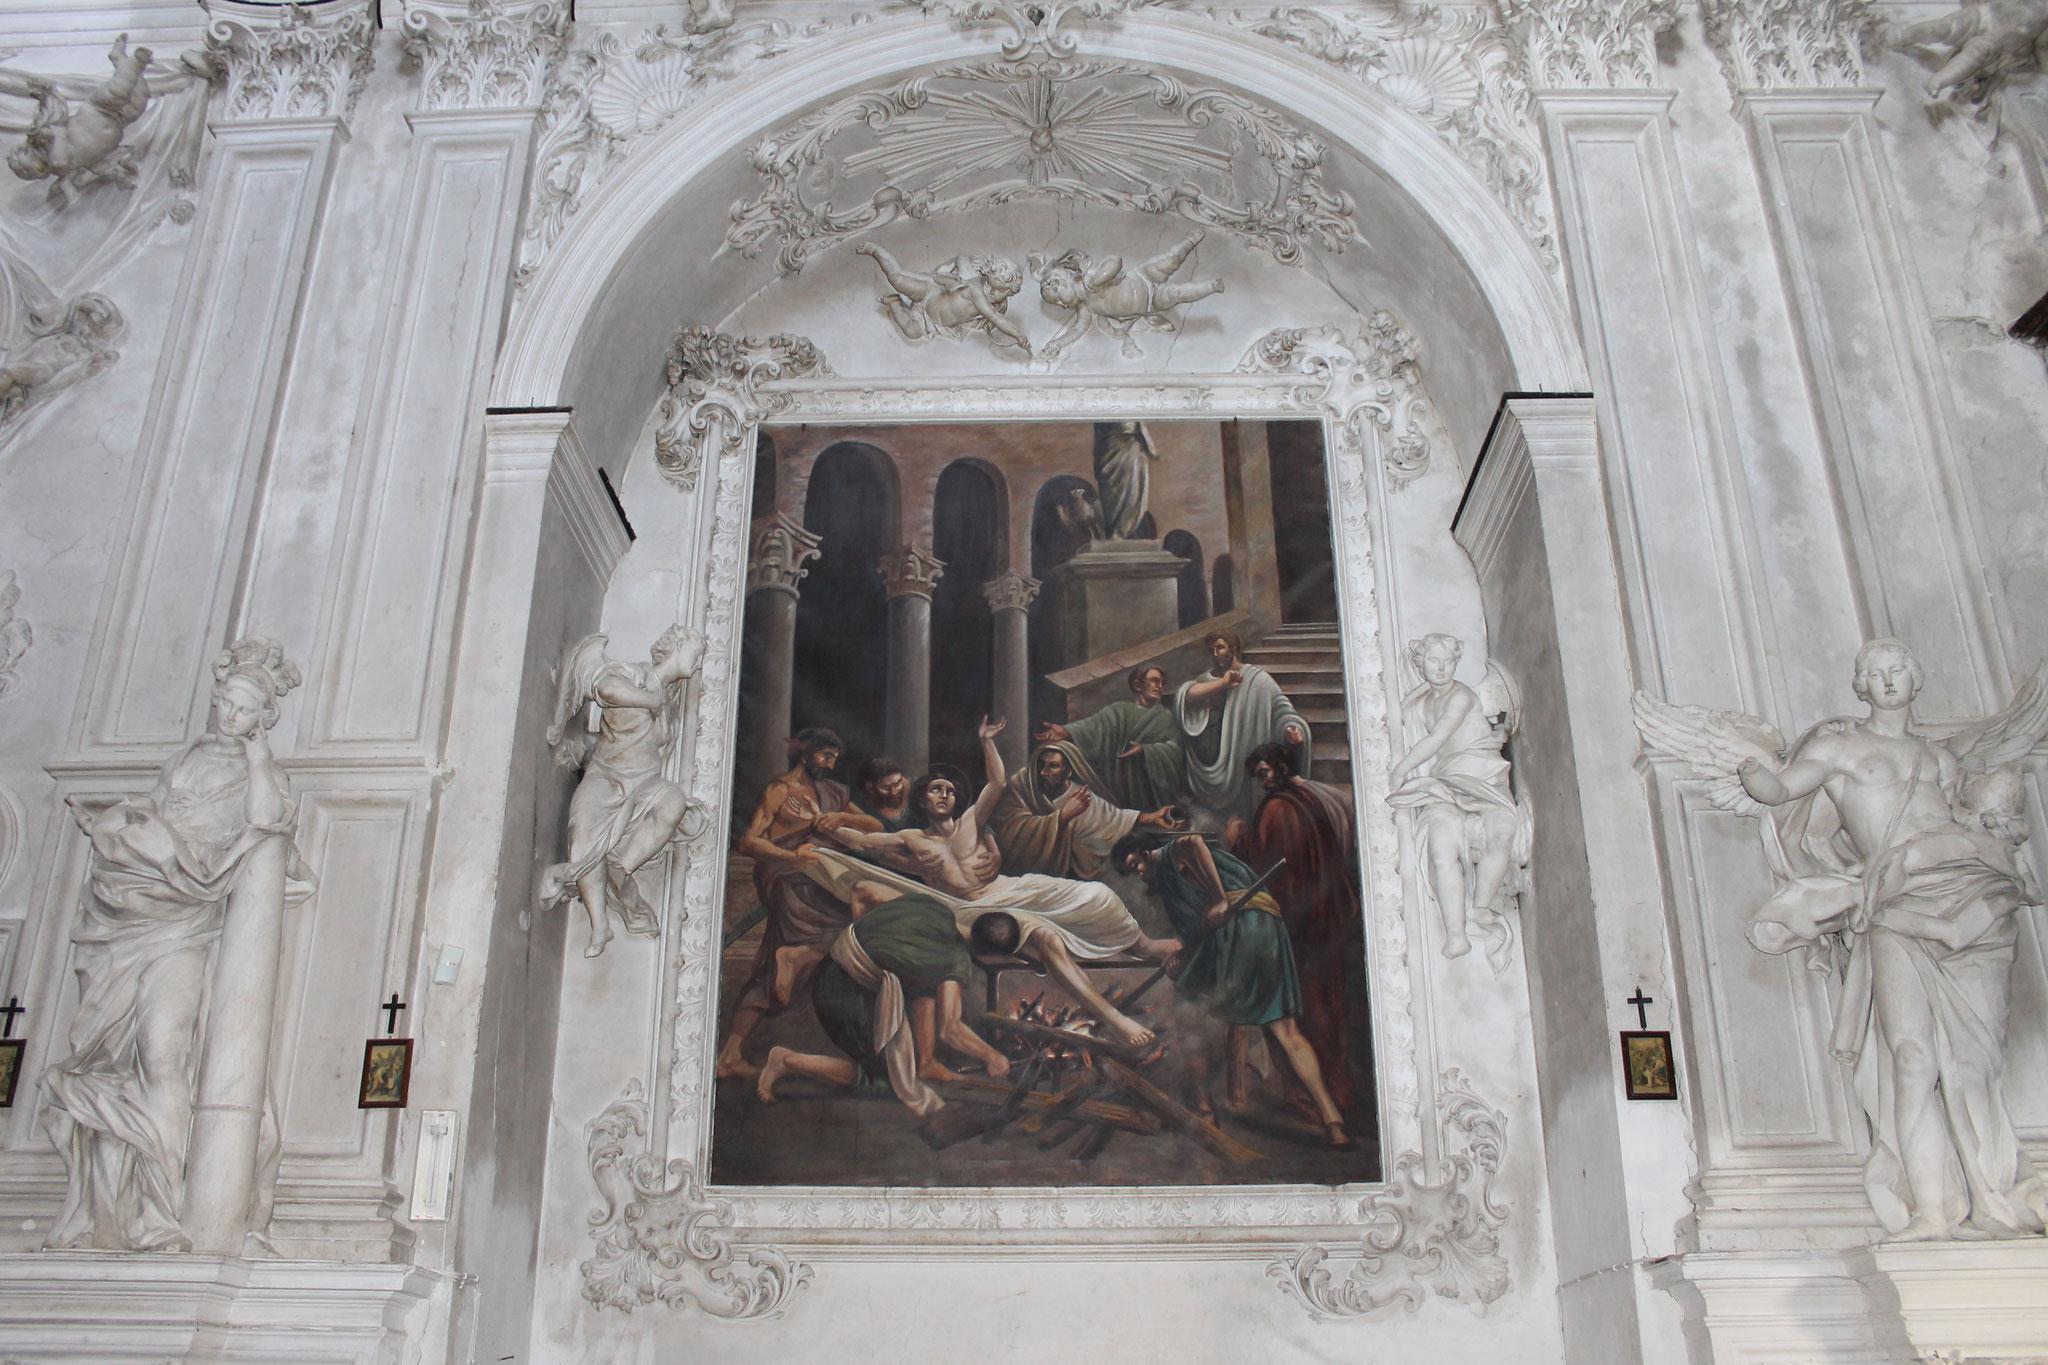 Martirio di San Lorenzo